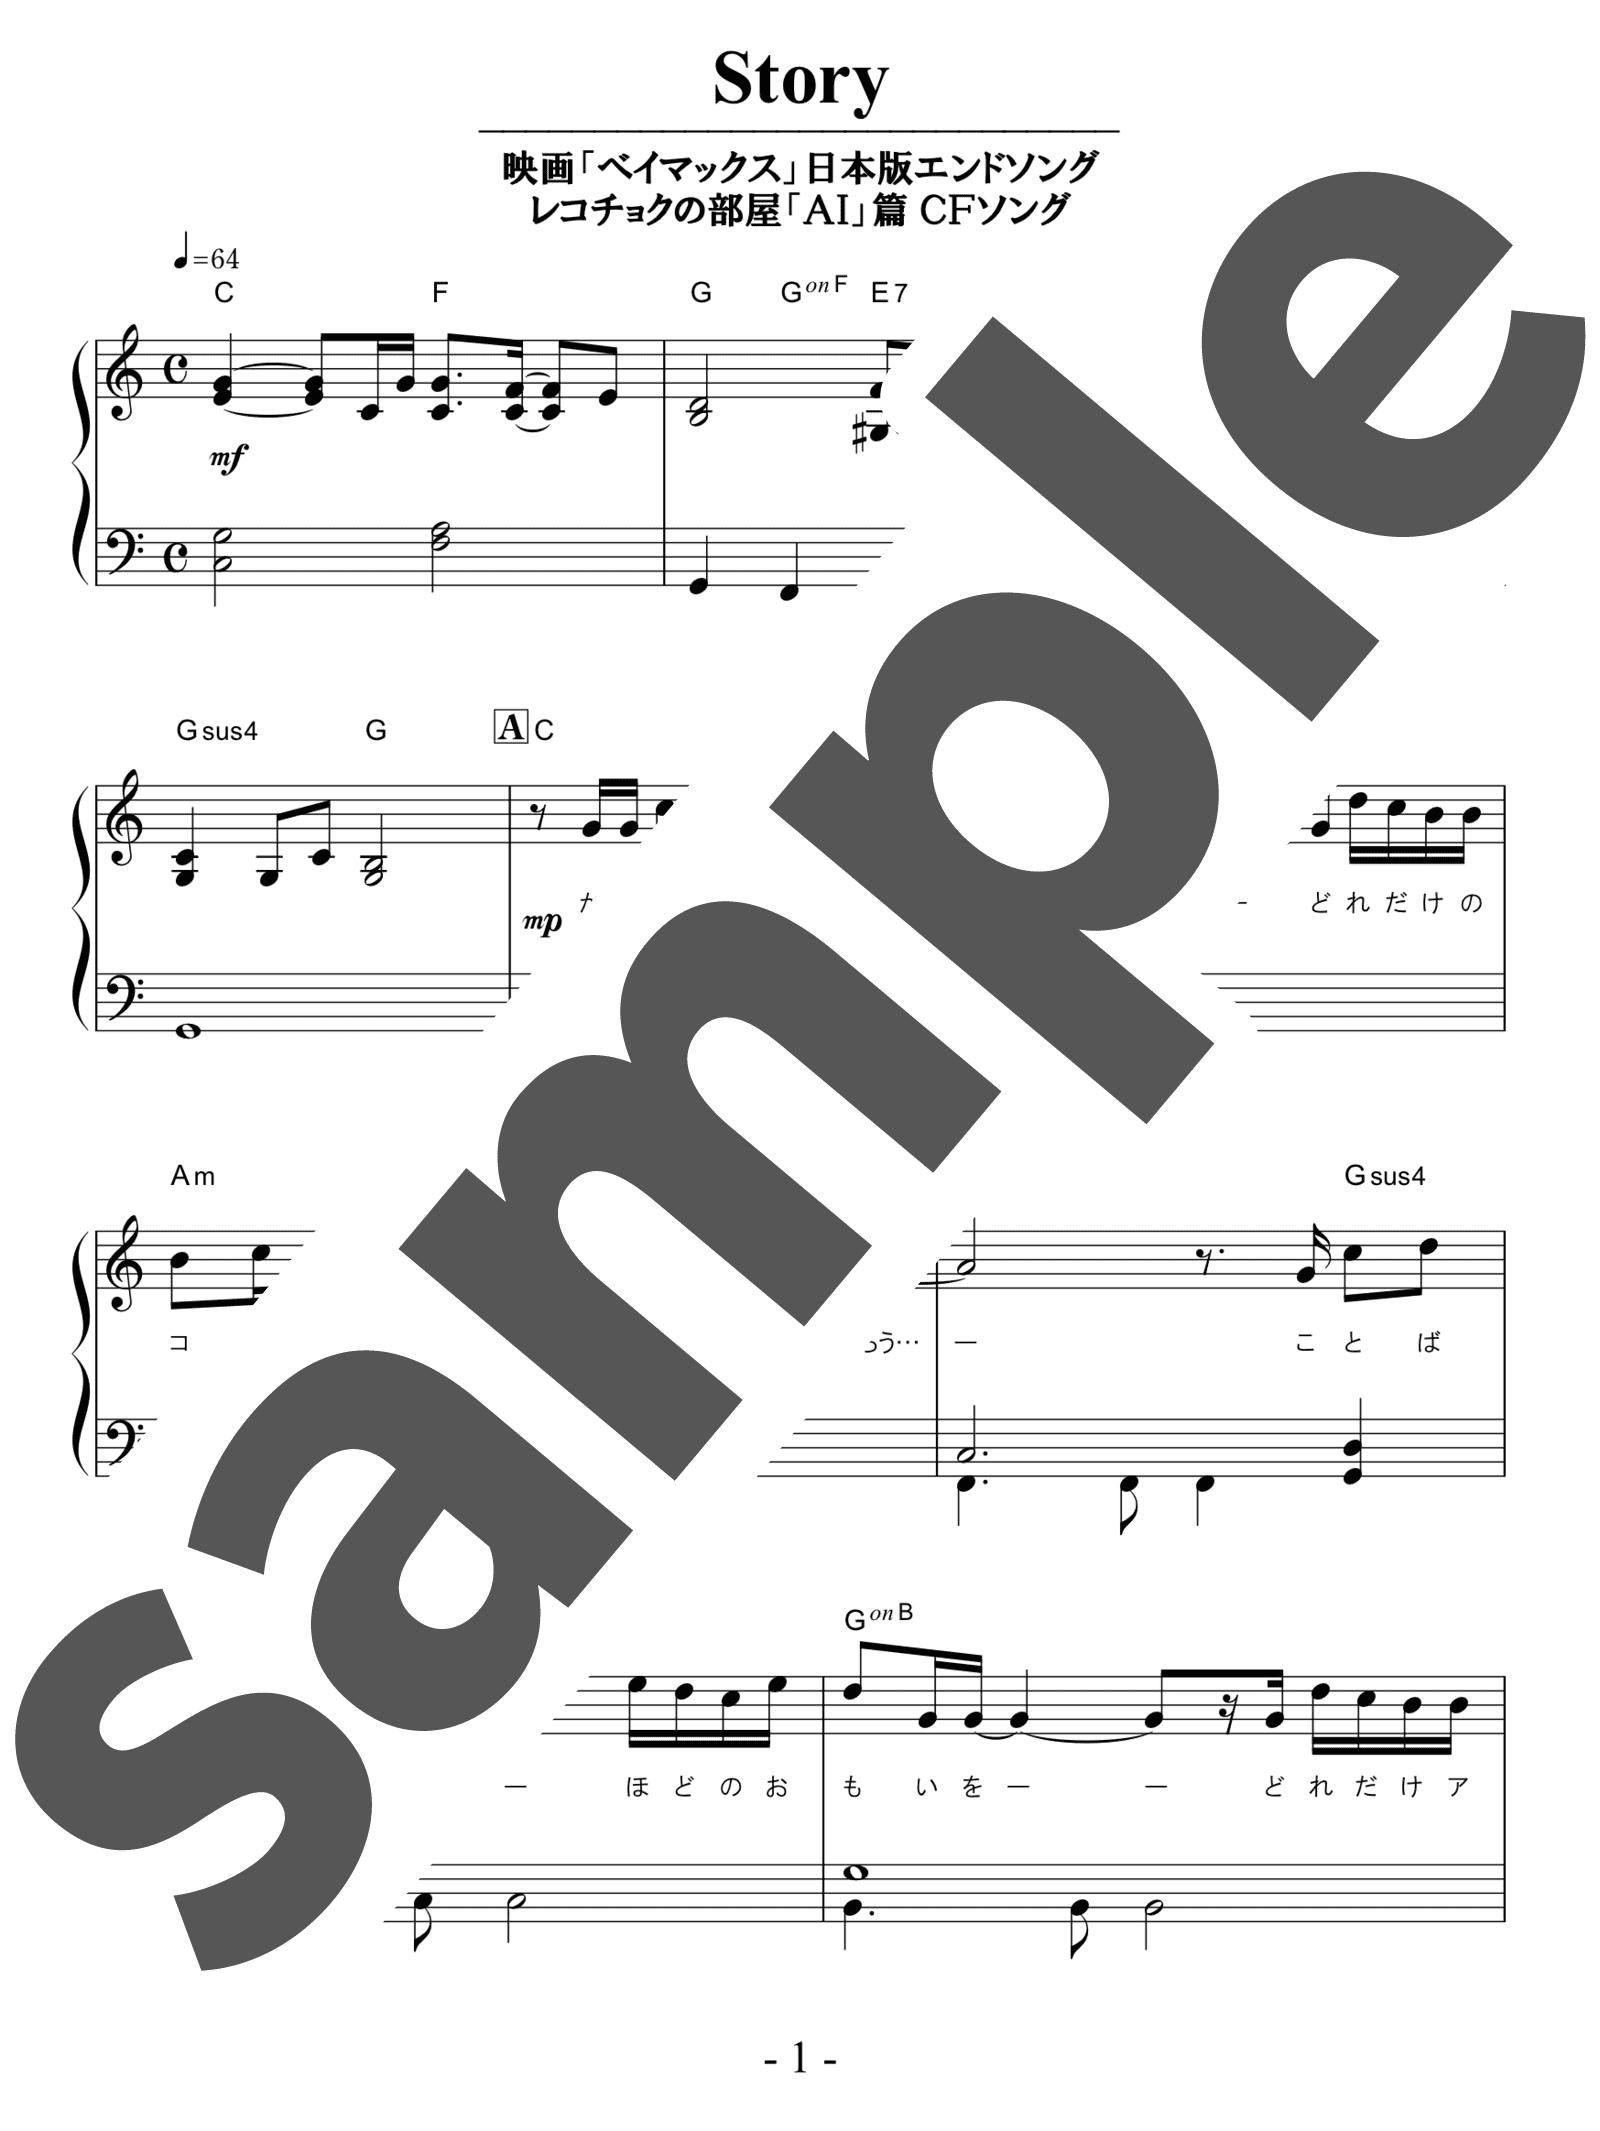 「Story」のサンプル楽譜